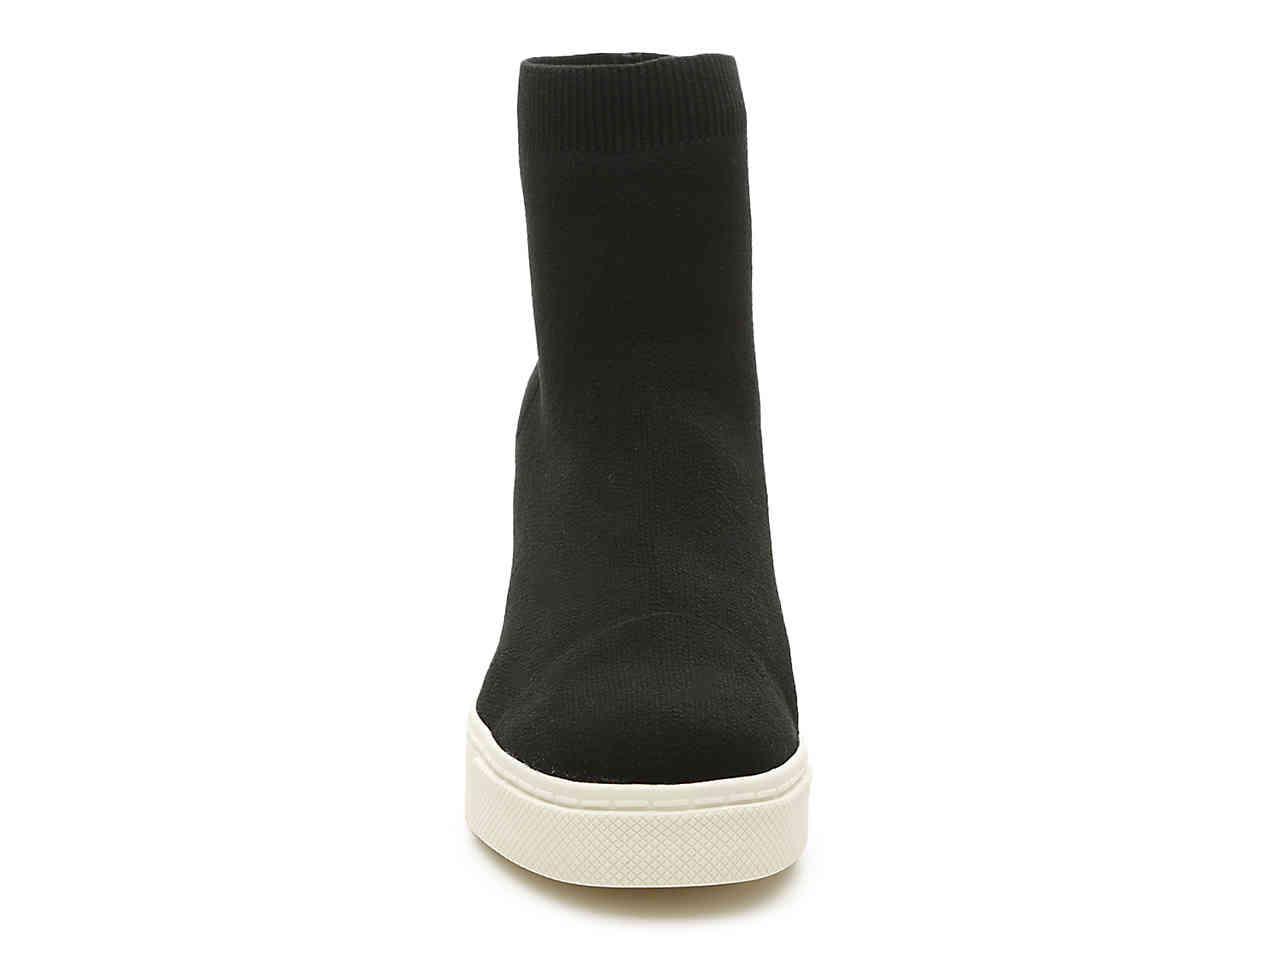 86d804a2527 Lyst - Steve Madden List High-top Wedge Sneaker in Black